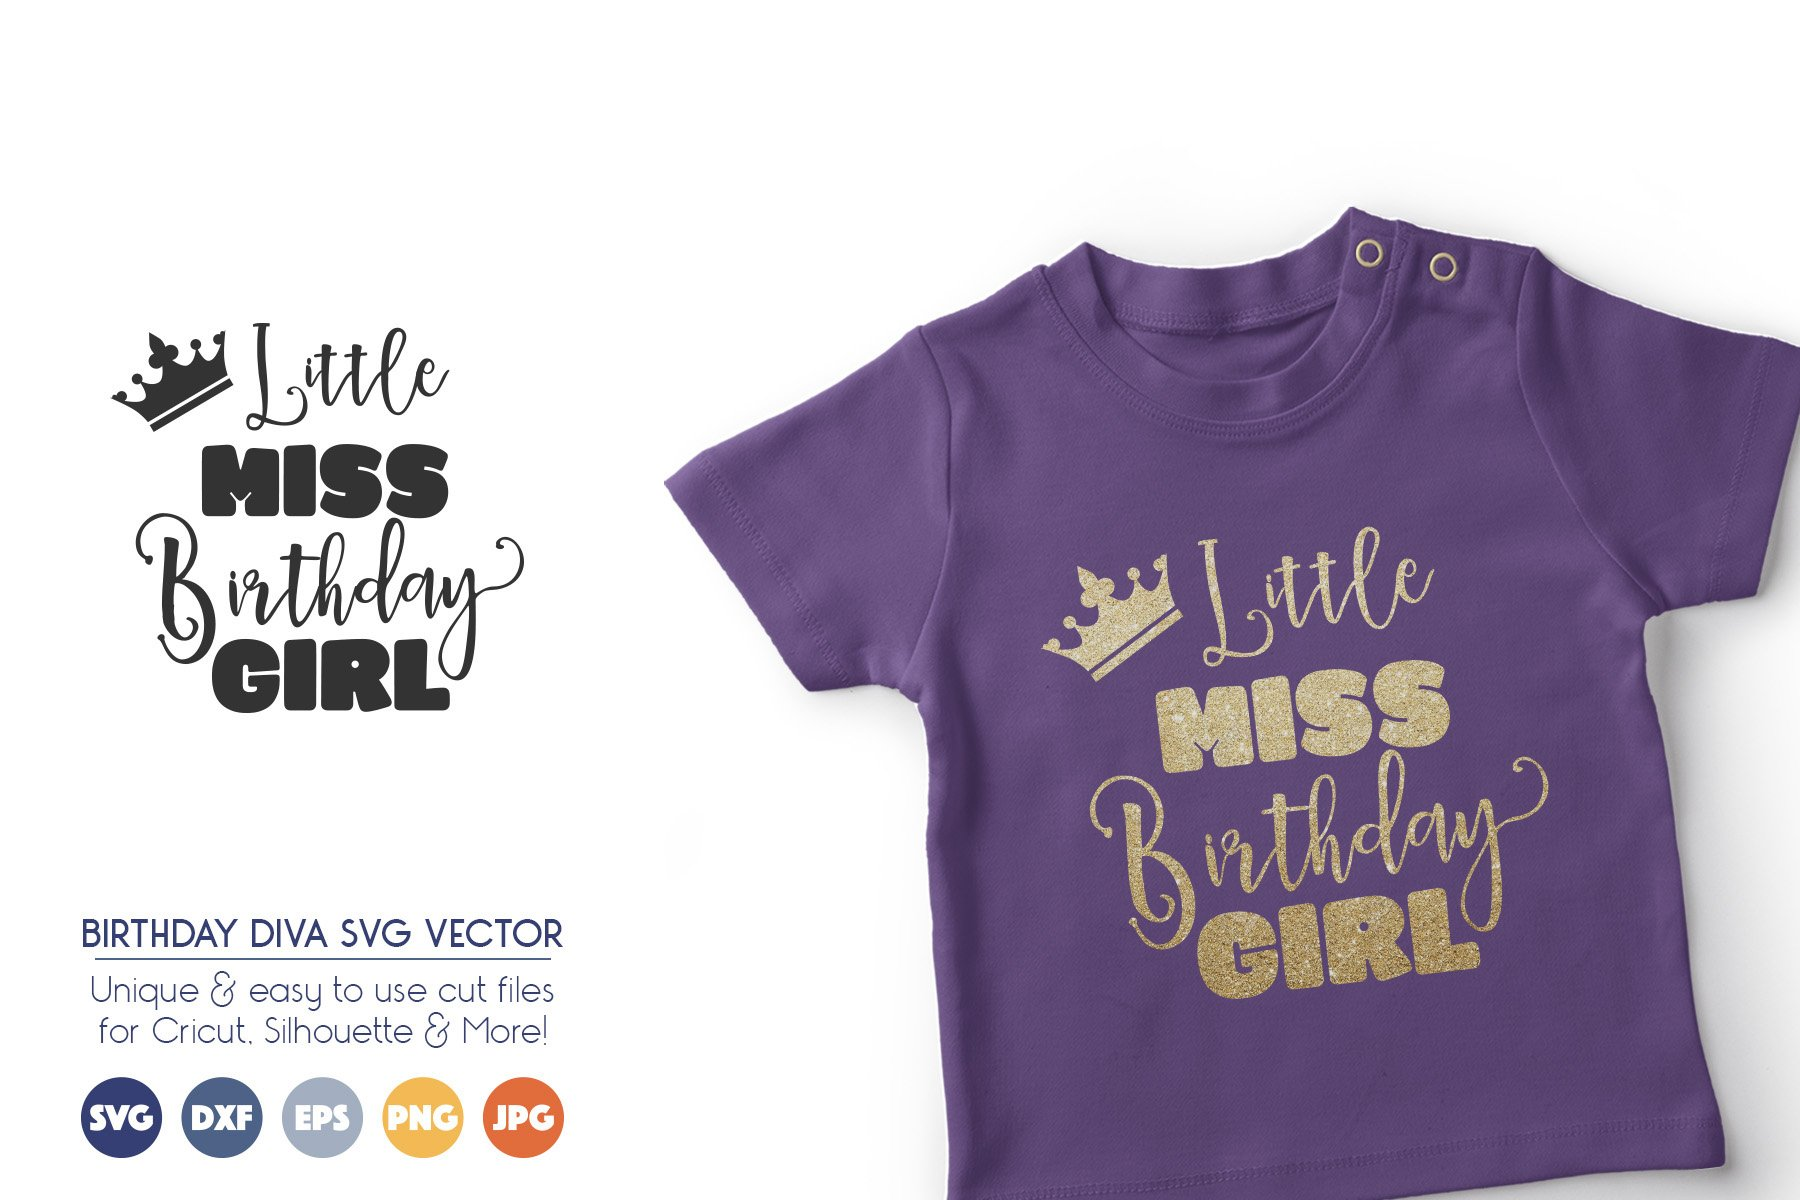 Birthday Girl SVG Cut Files - Princess SVG File example image 1